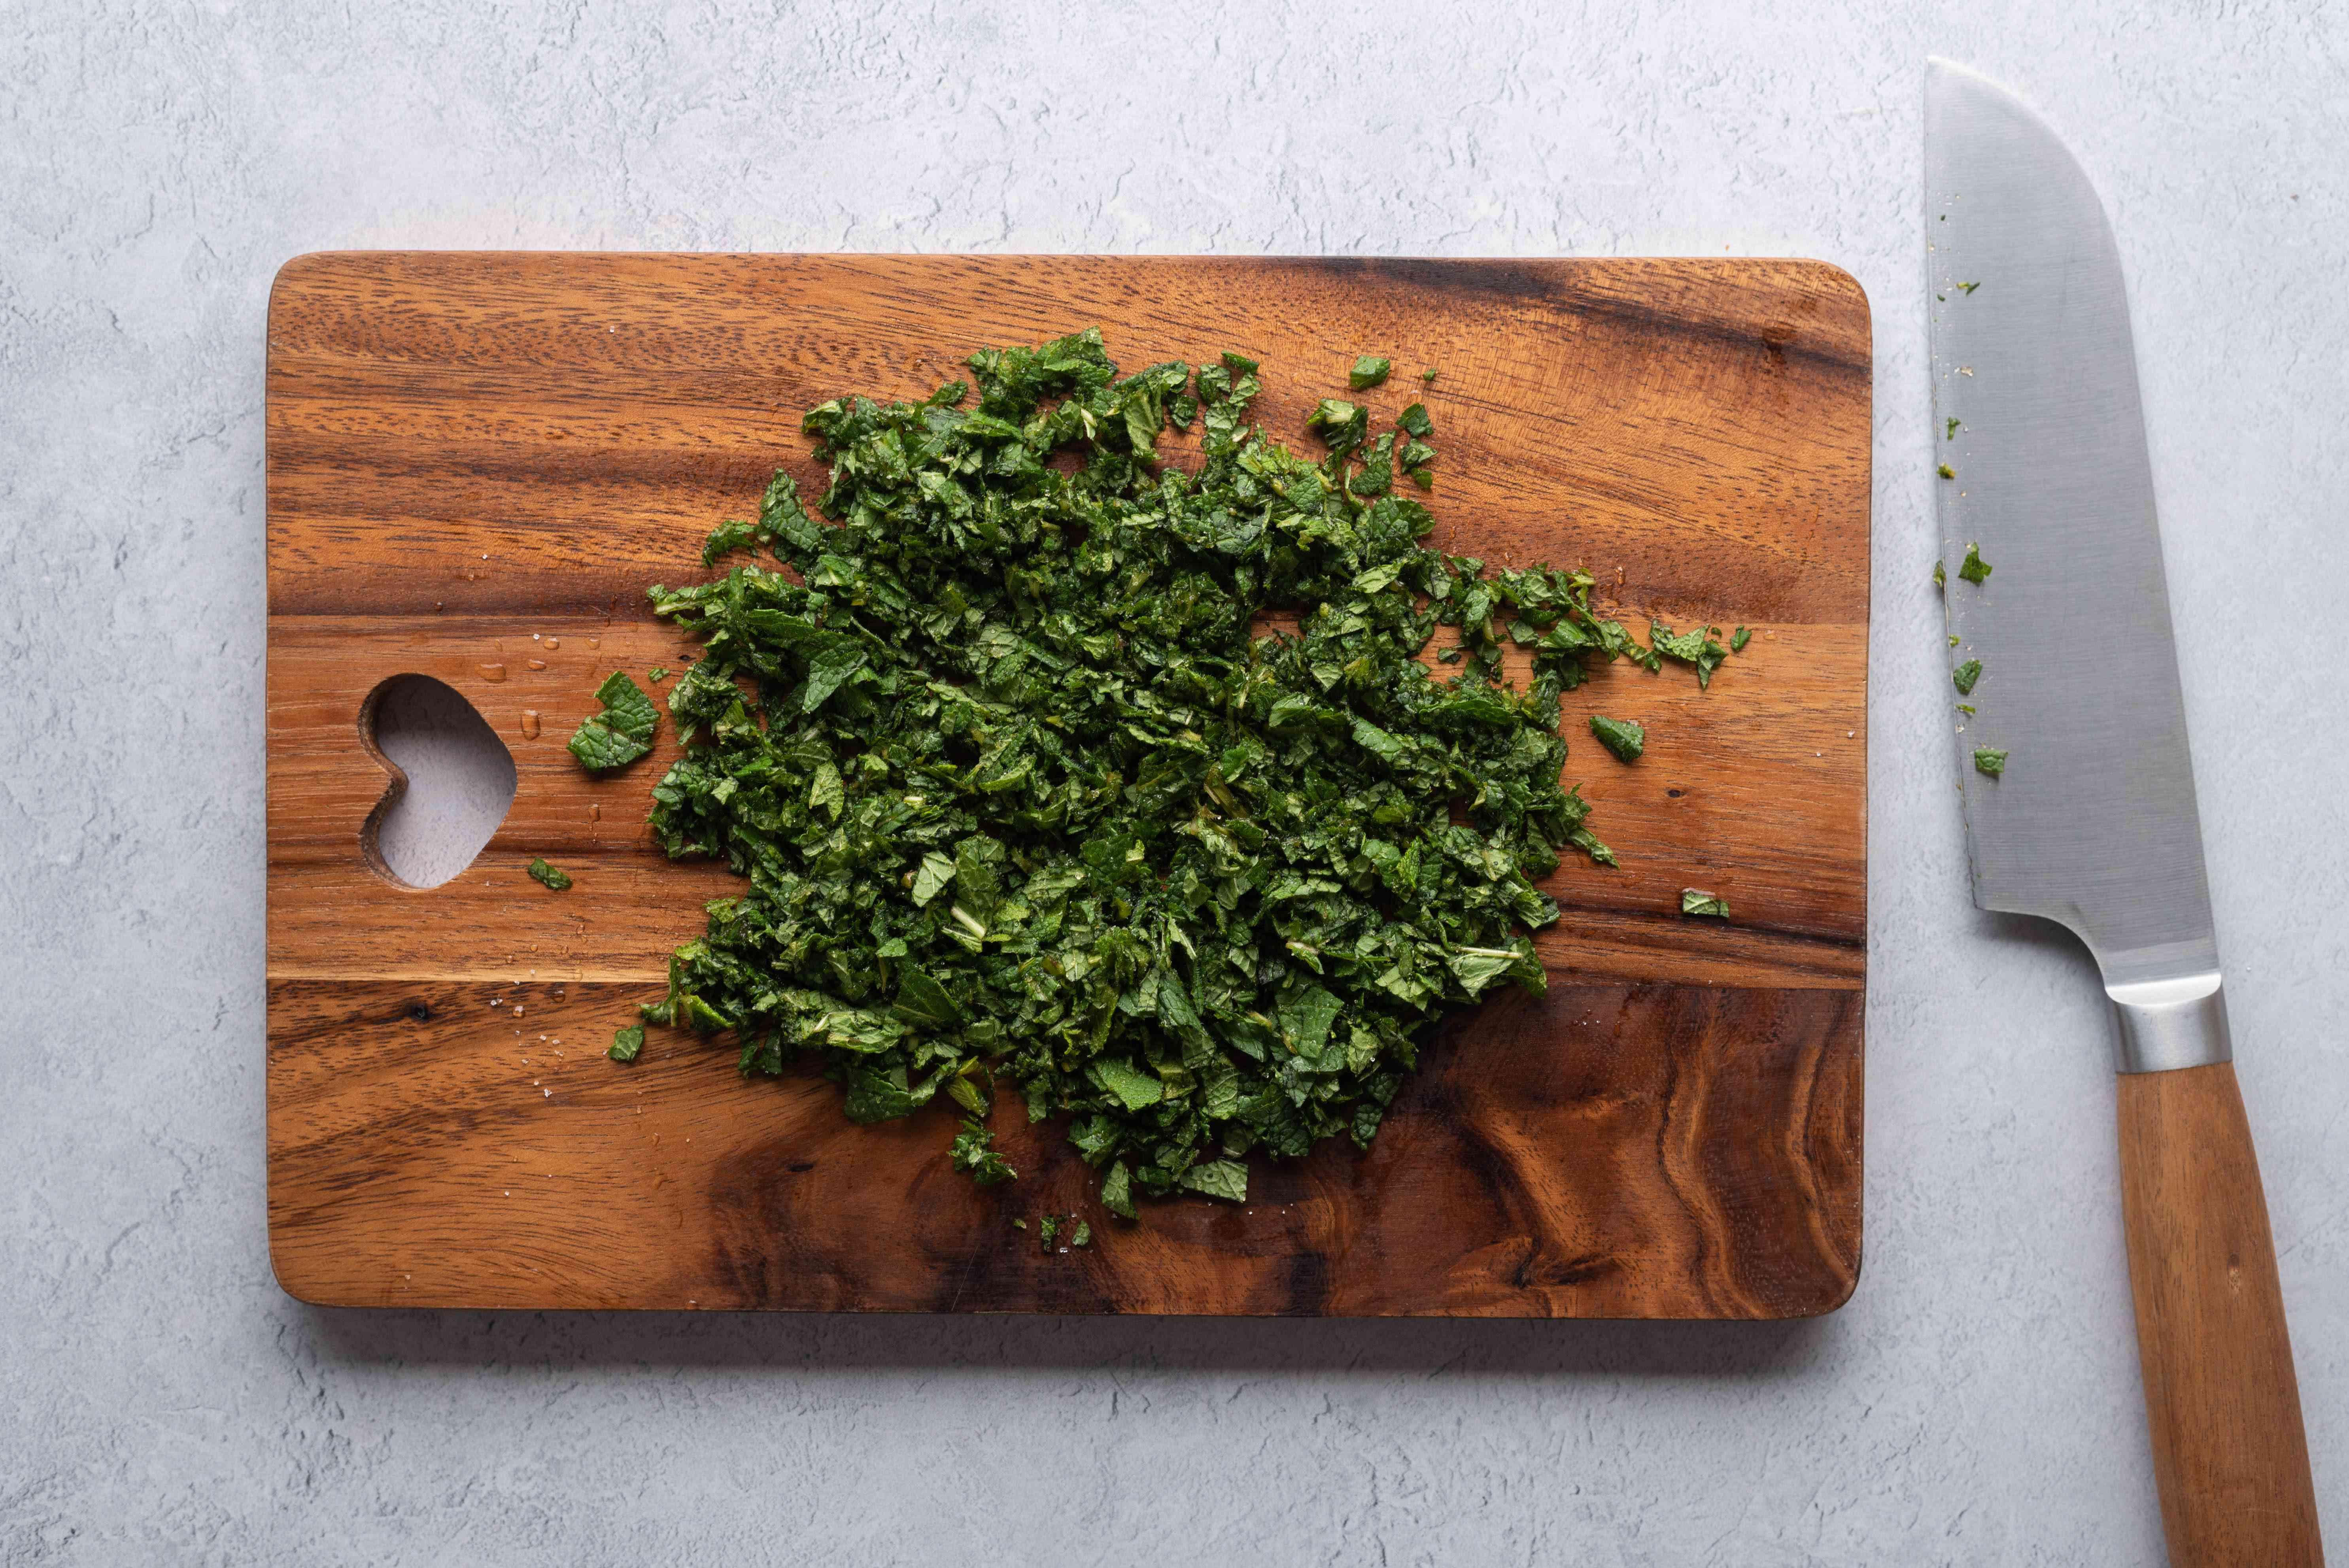 chopped mint leaves on a wood cutting board